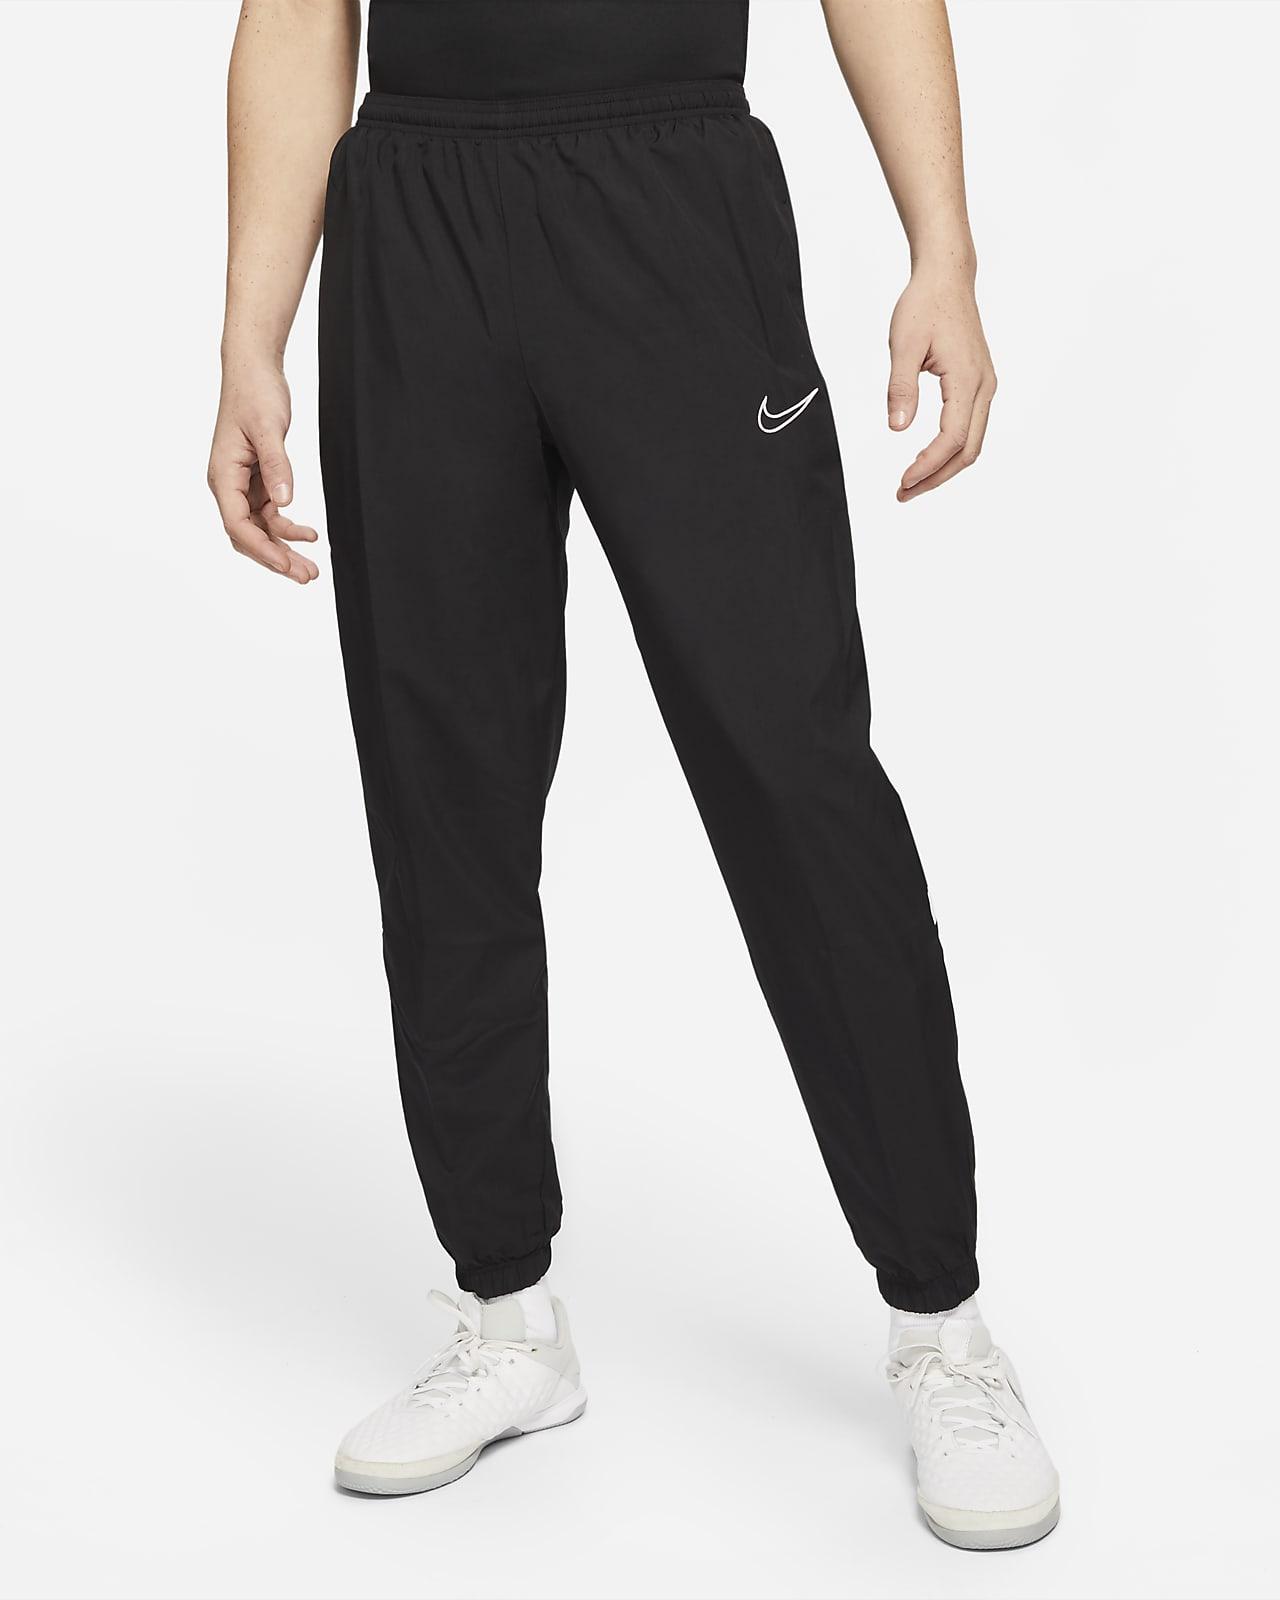 Nike Dri-FIT Academy Men's Woven Soccer Track Pants